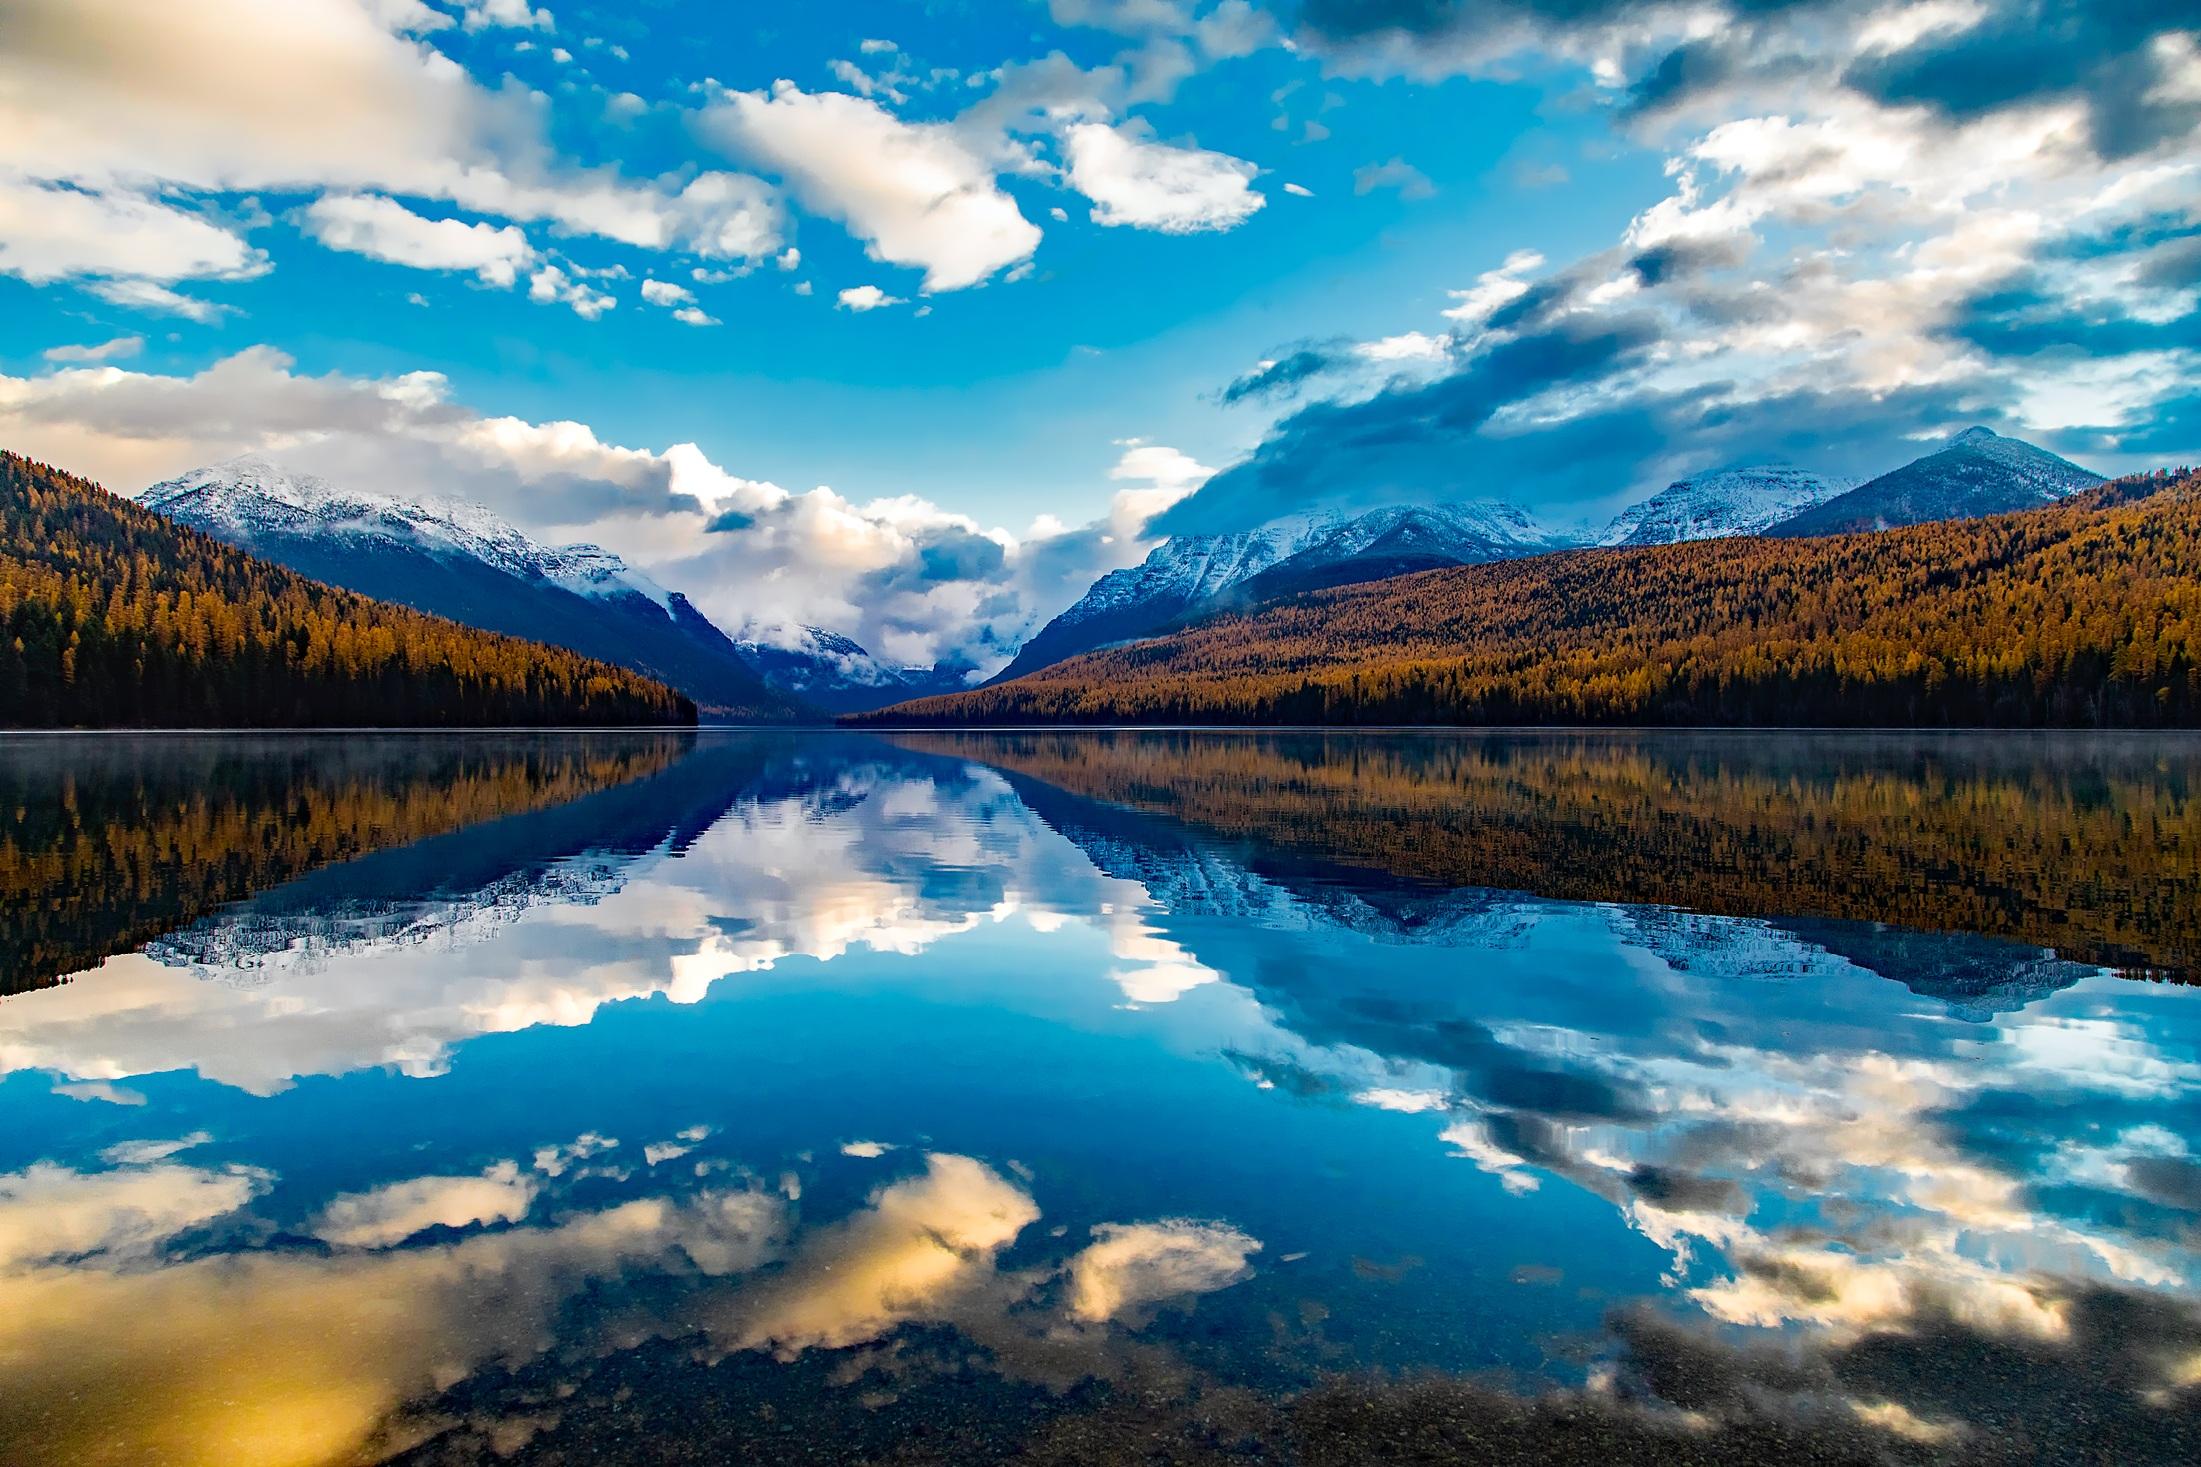 Natural Falls Wallpaper Free Download Free Stock Photo Of Clouds Lake Lake Mcdonald